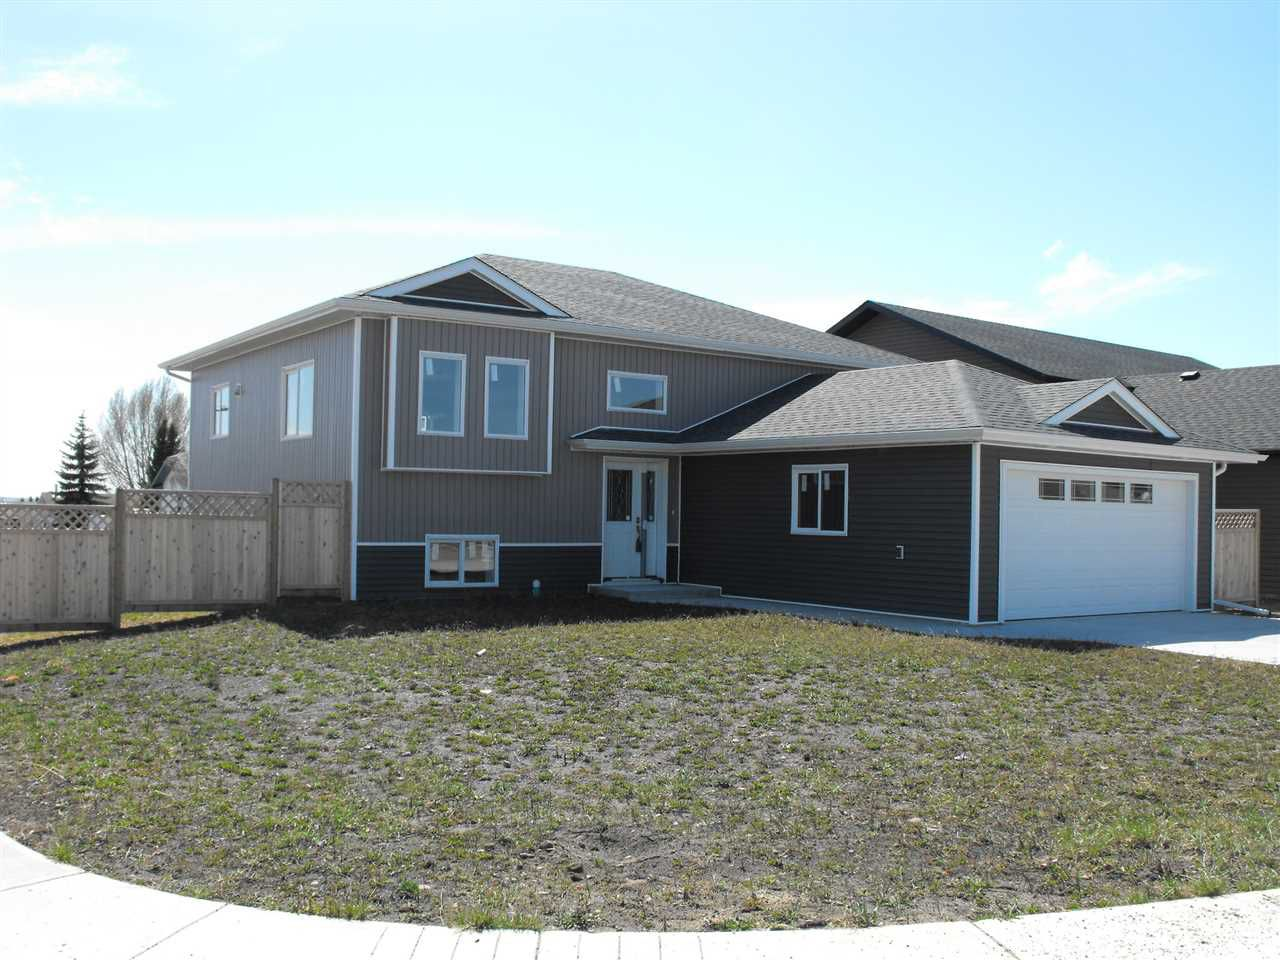 Main Photo: 5101 60 Avenue: Elk Point House for sale : MLS®# E4042326